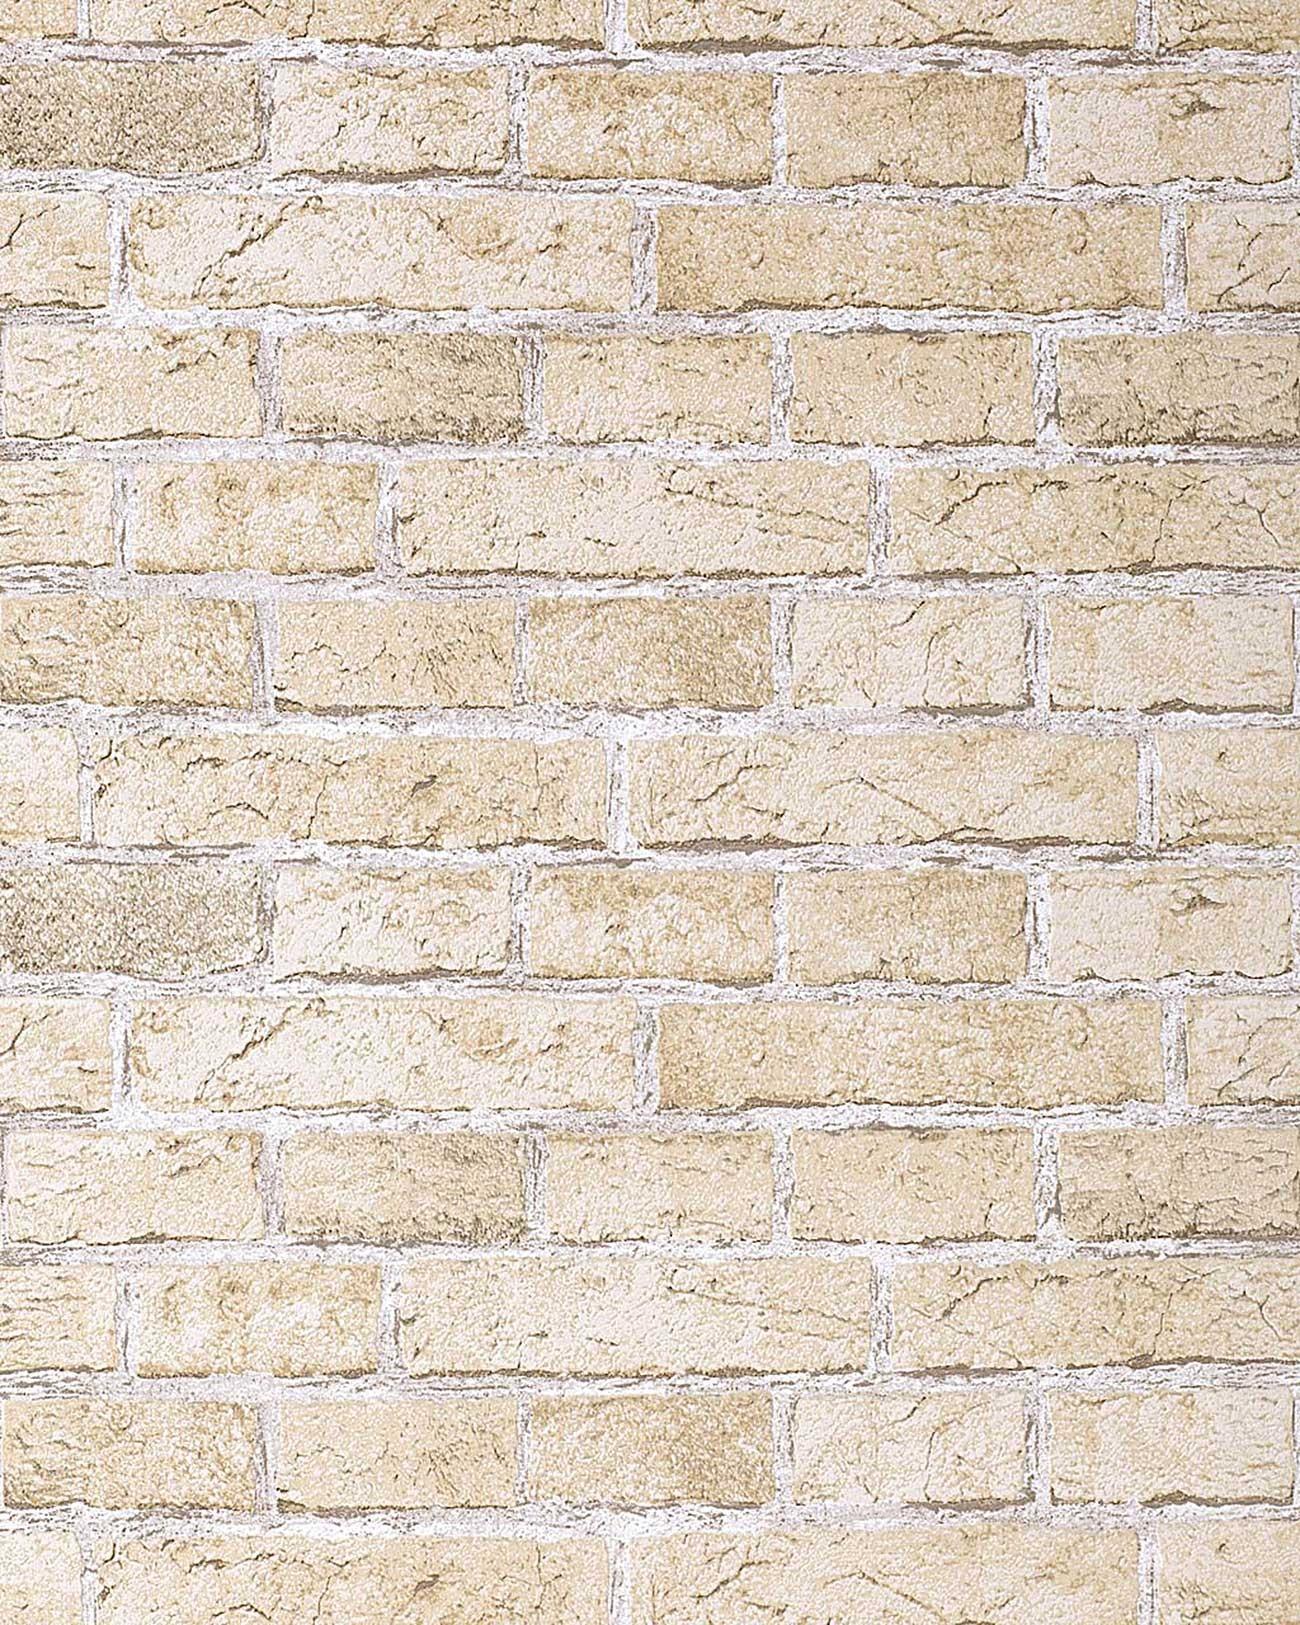 Decorative vintage wall wallpaper wallcovering rustic brick edem decorative vintage wall wallpaper wallcovering rustic brick edem 583 20 mural stone brix look vinyl sand beige amipublicfo Images